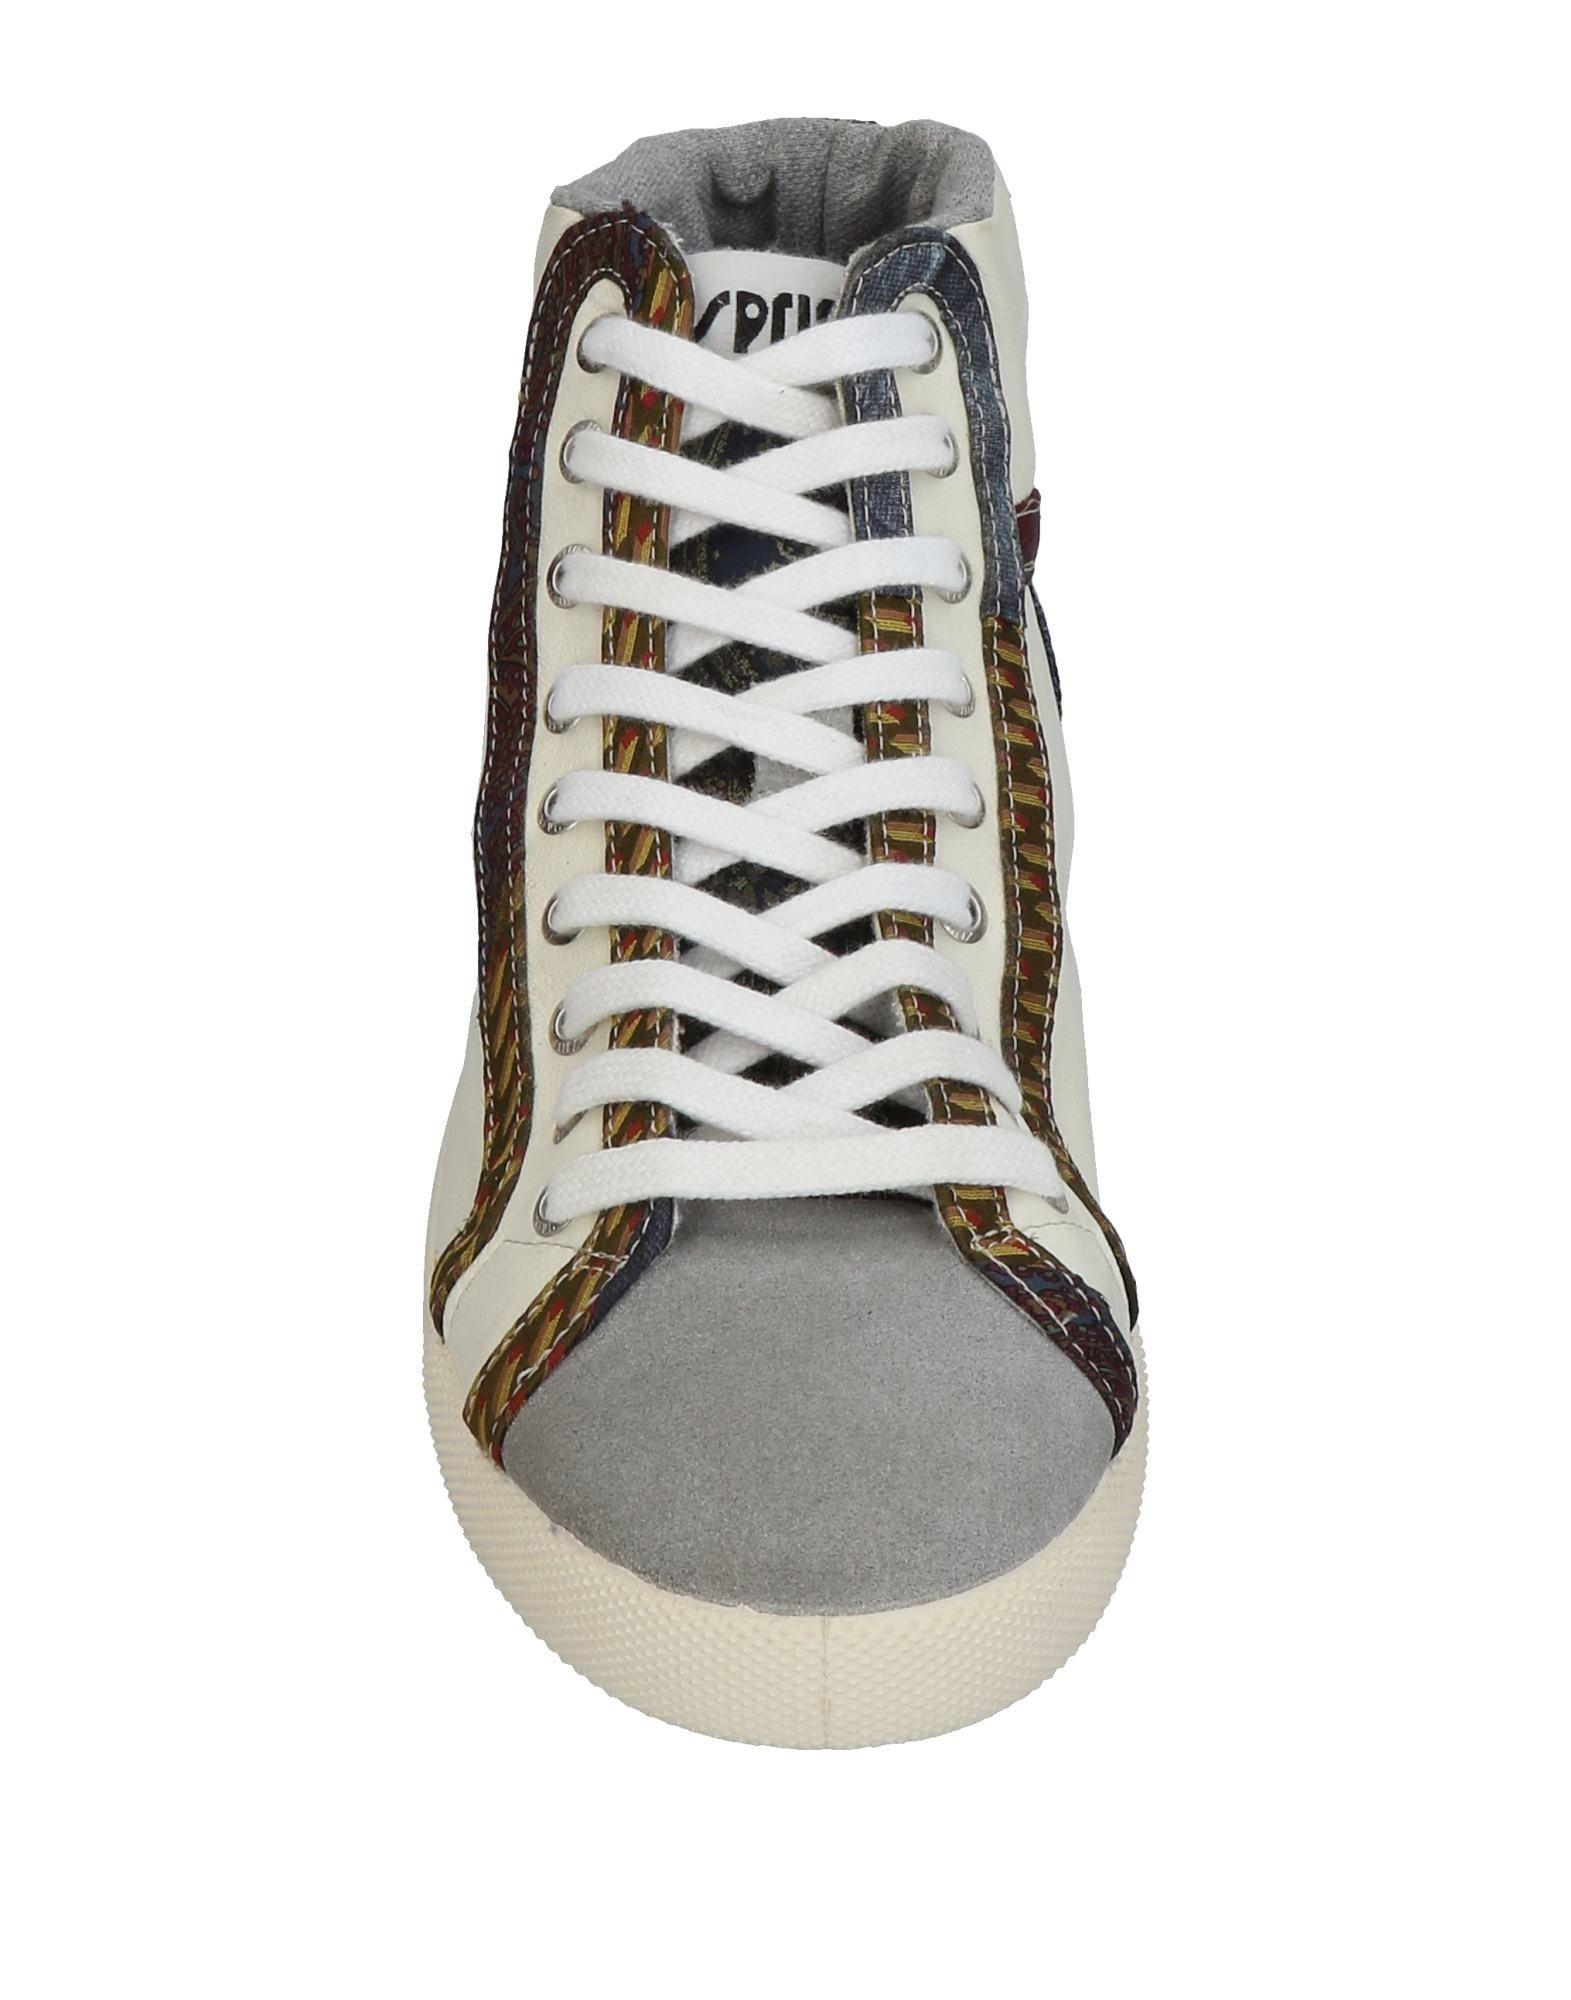 Springa lohnt Sneakers Herren Gutes Preis-Leistungs-Verhältnis, es lohnt Springa sich 953303